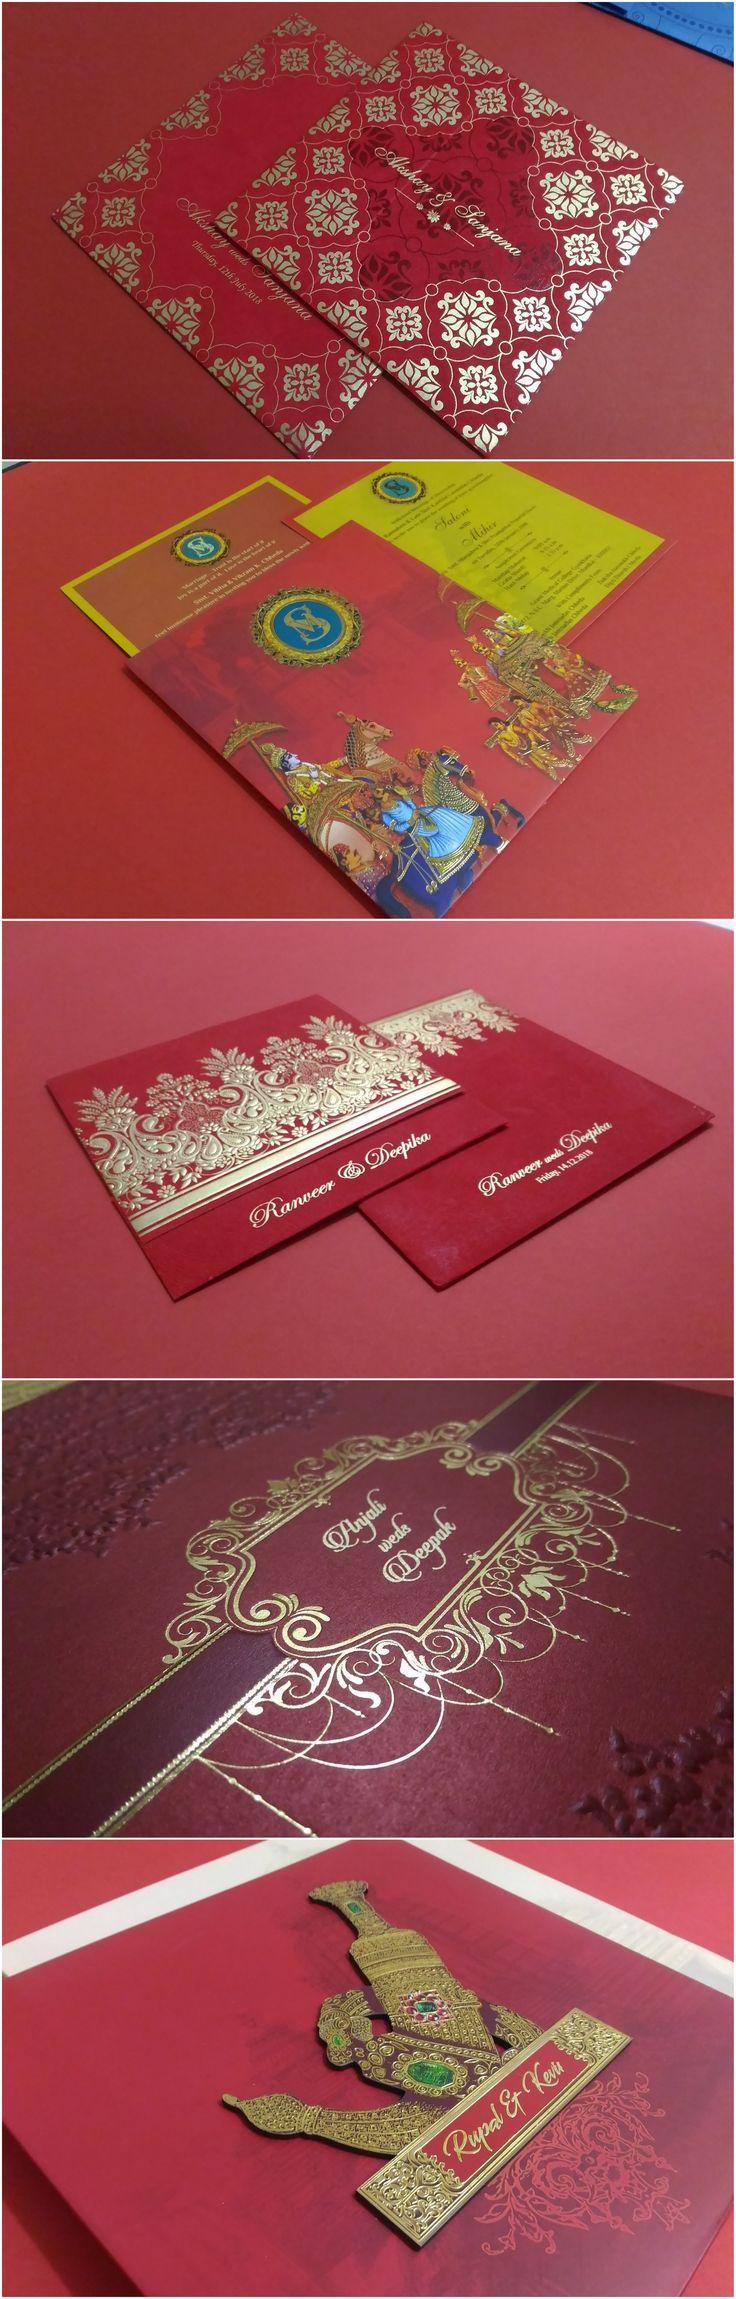 16 best Designer Wedding Invitations images on Pinterest | Wedding ...